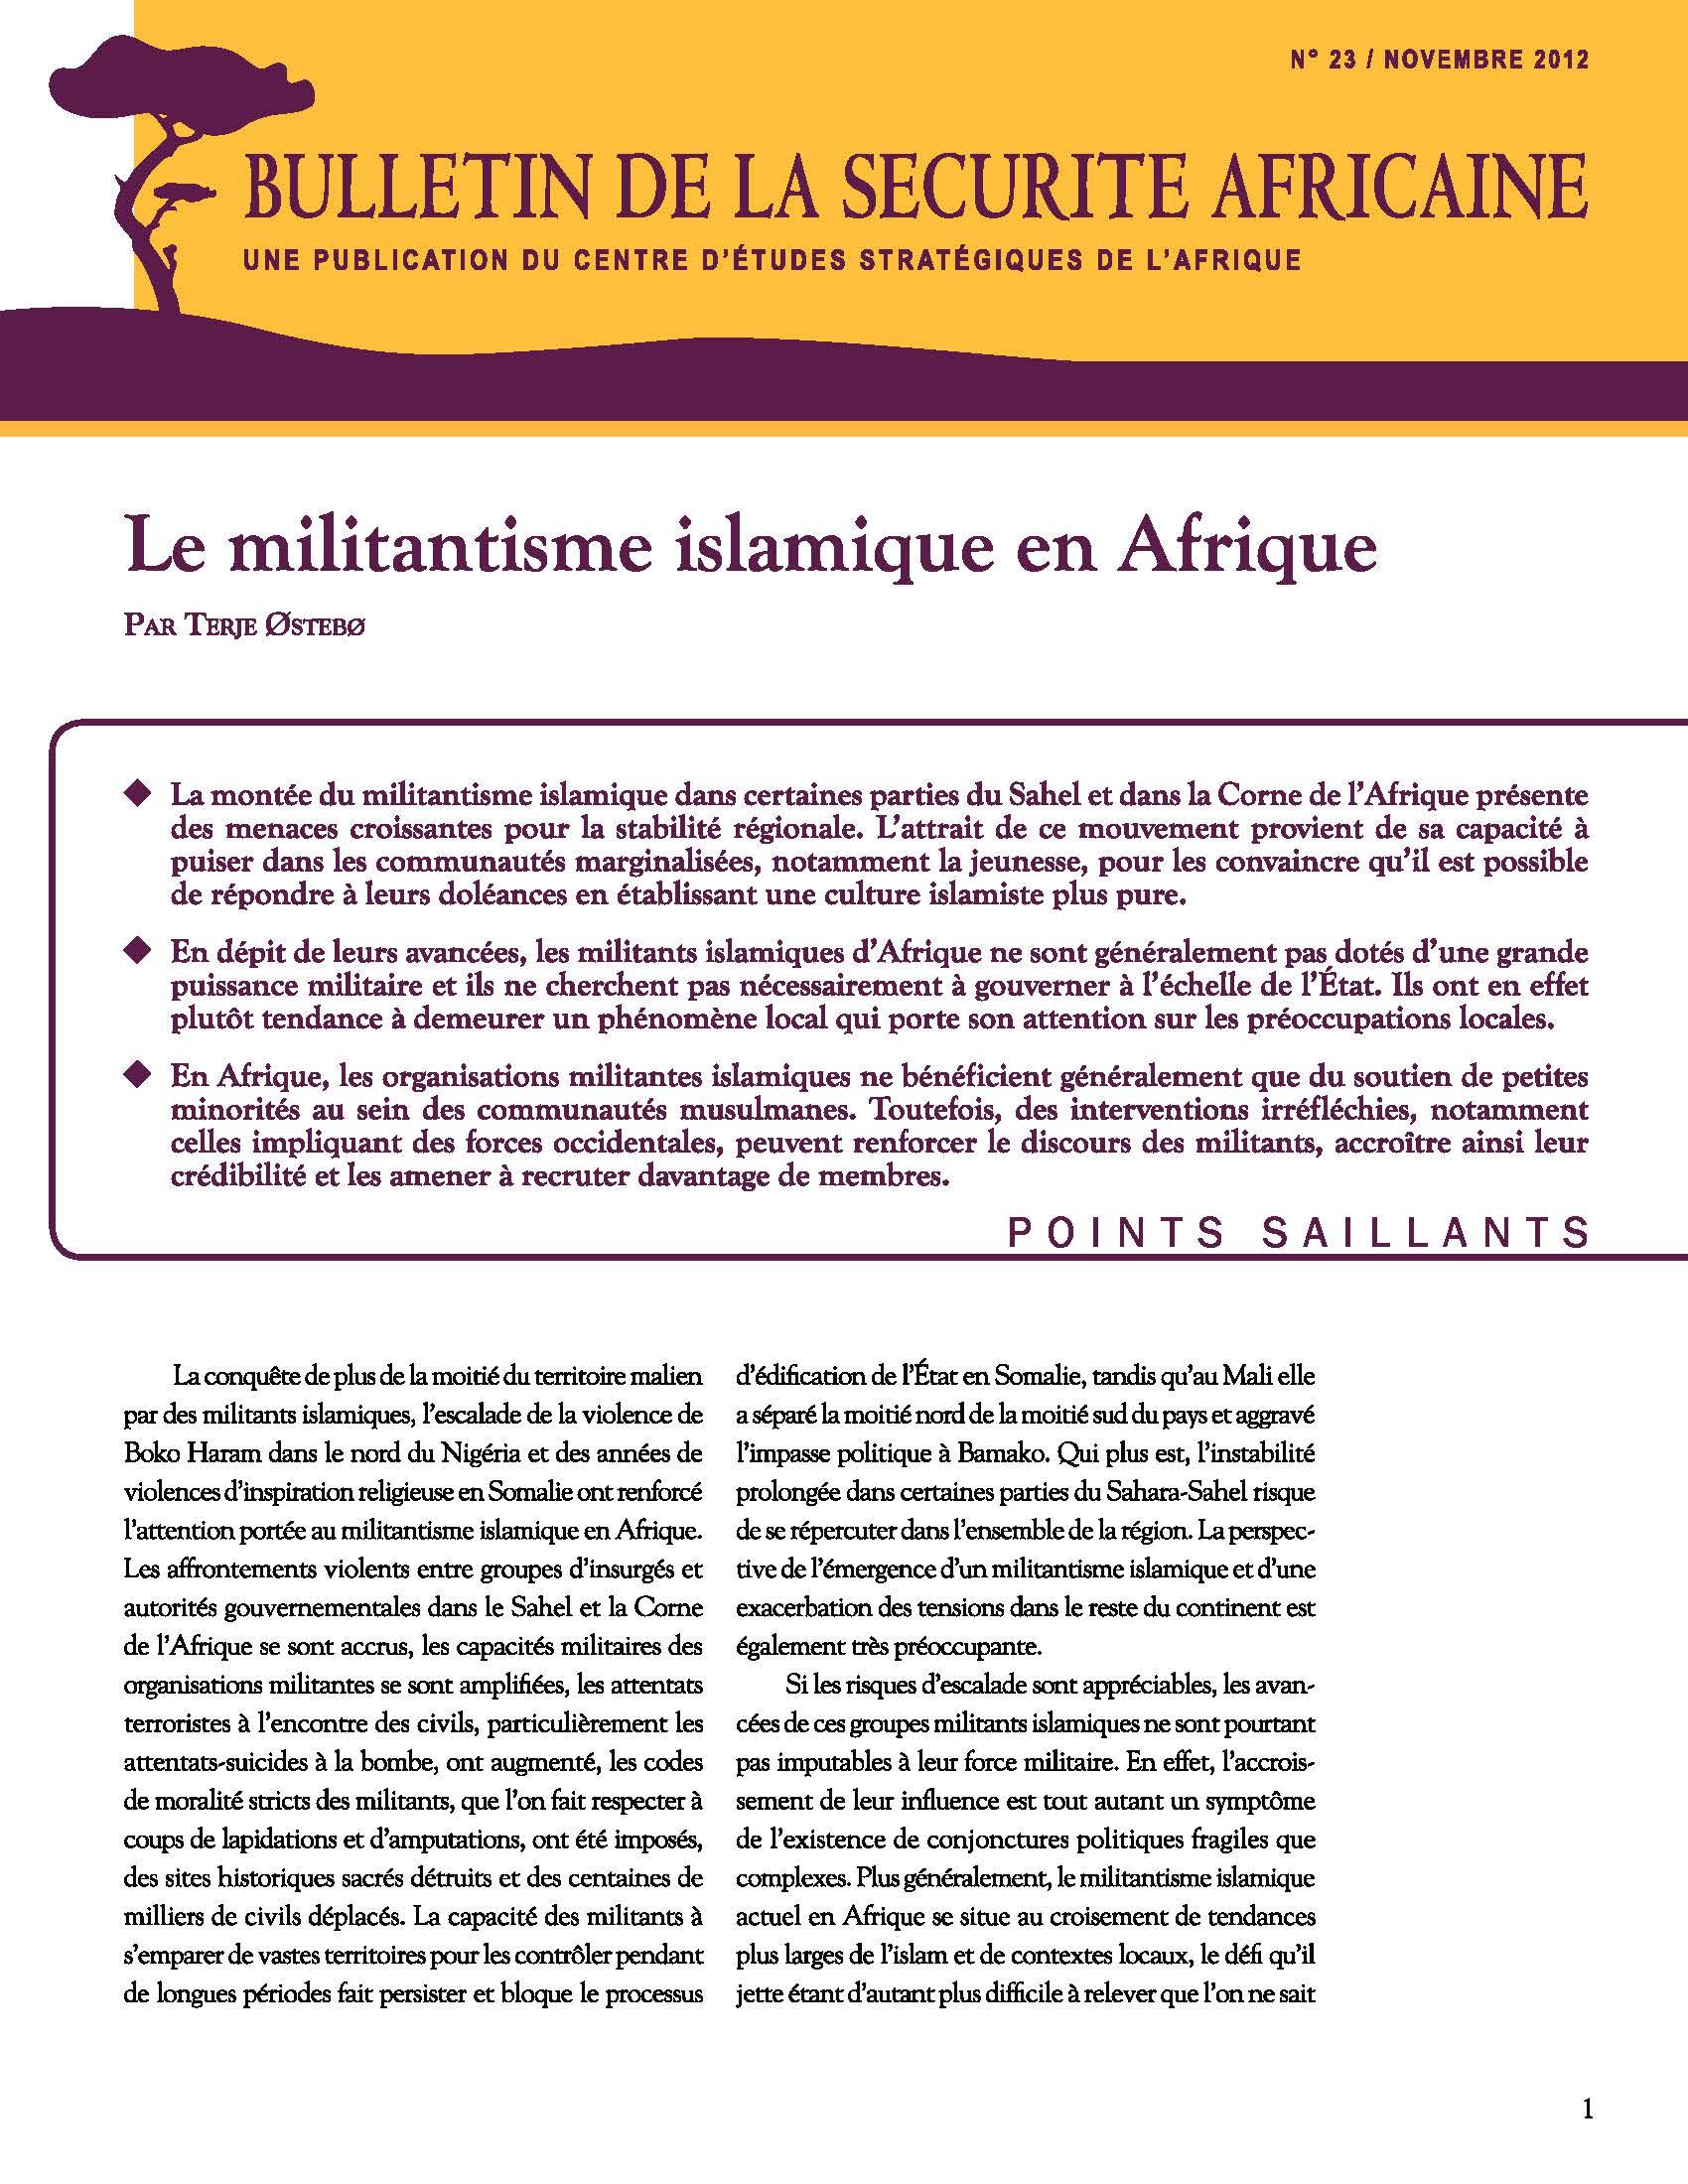 Africa-Security-Brief-No.-23-FR page 1